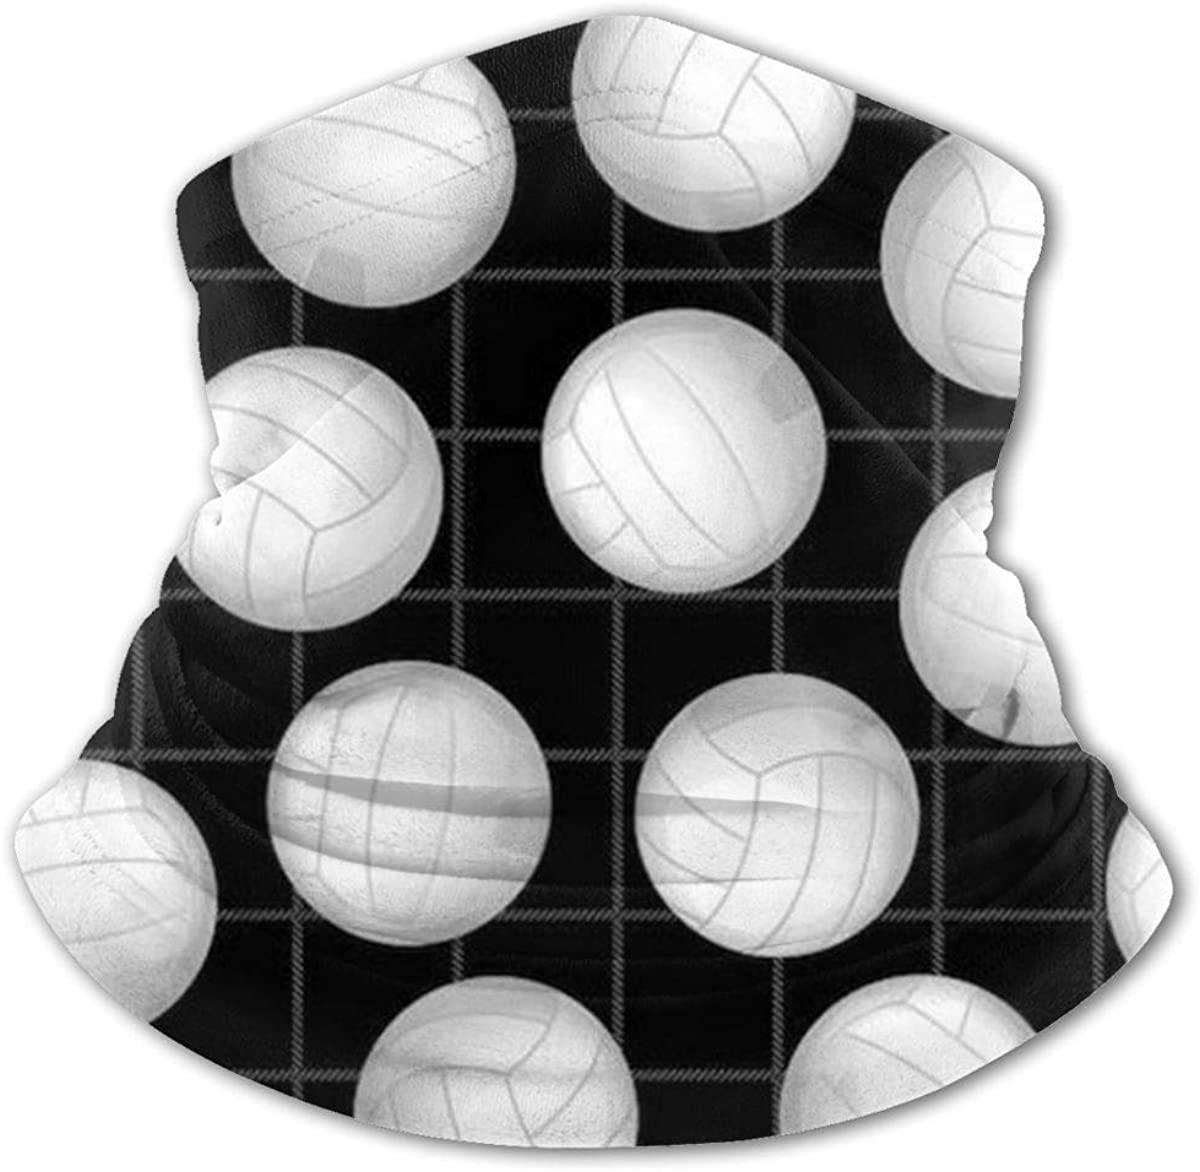 Volleyball Sports Headwear For Girls And Boys, Head Wrap, Neck Gaiter, Headband, Tenn Fishing Mask, Magic Scarf, Tube Mask, Face Bandana Mask For Camping Running Cycling